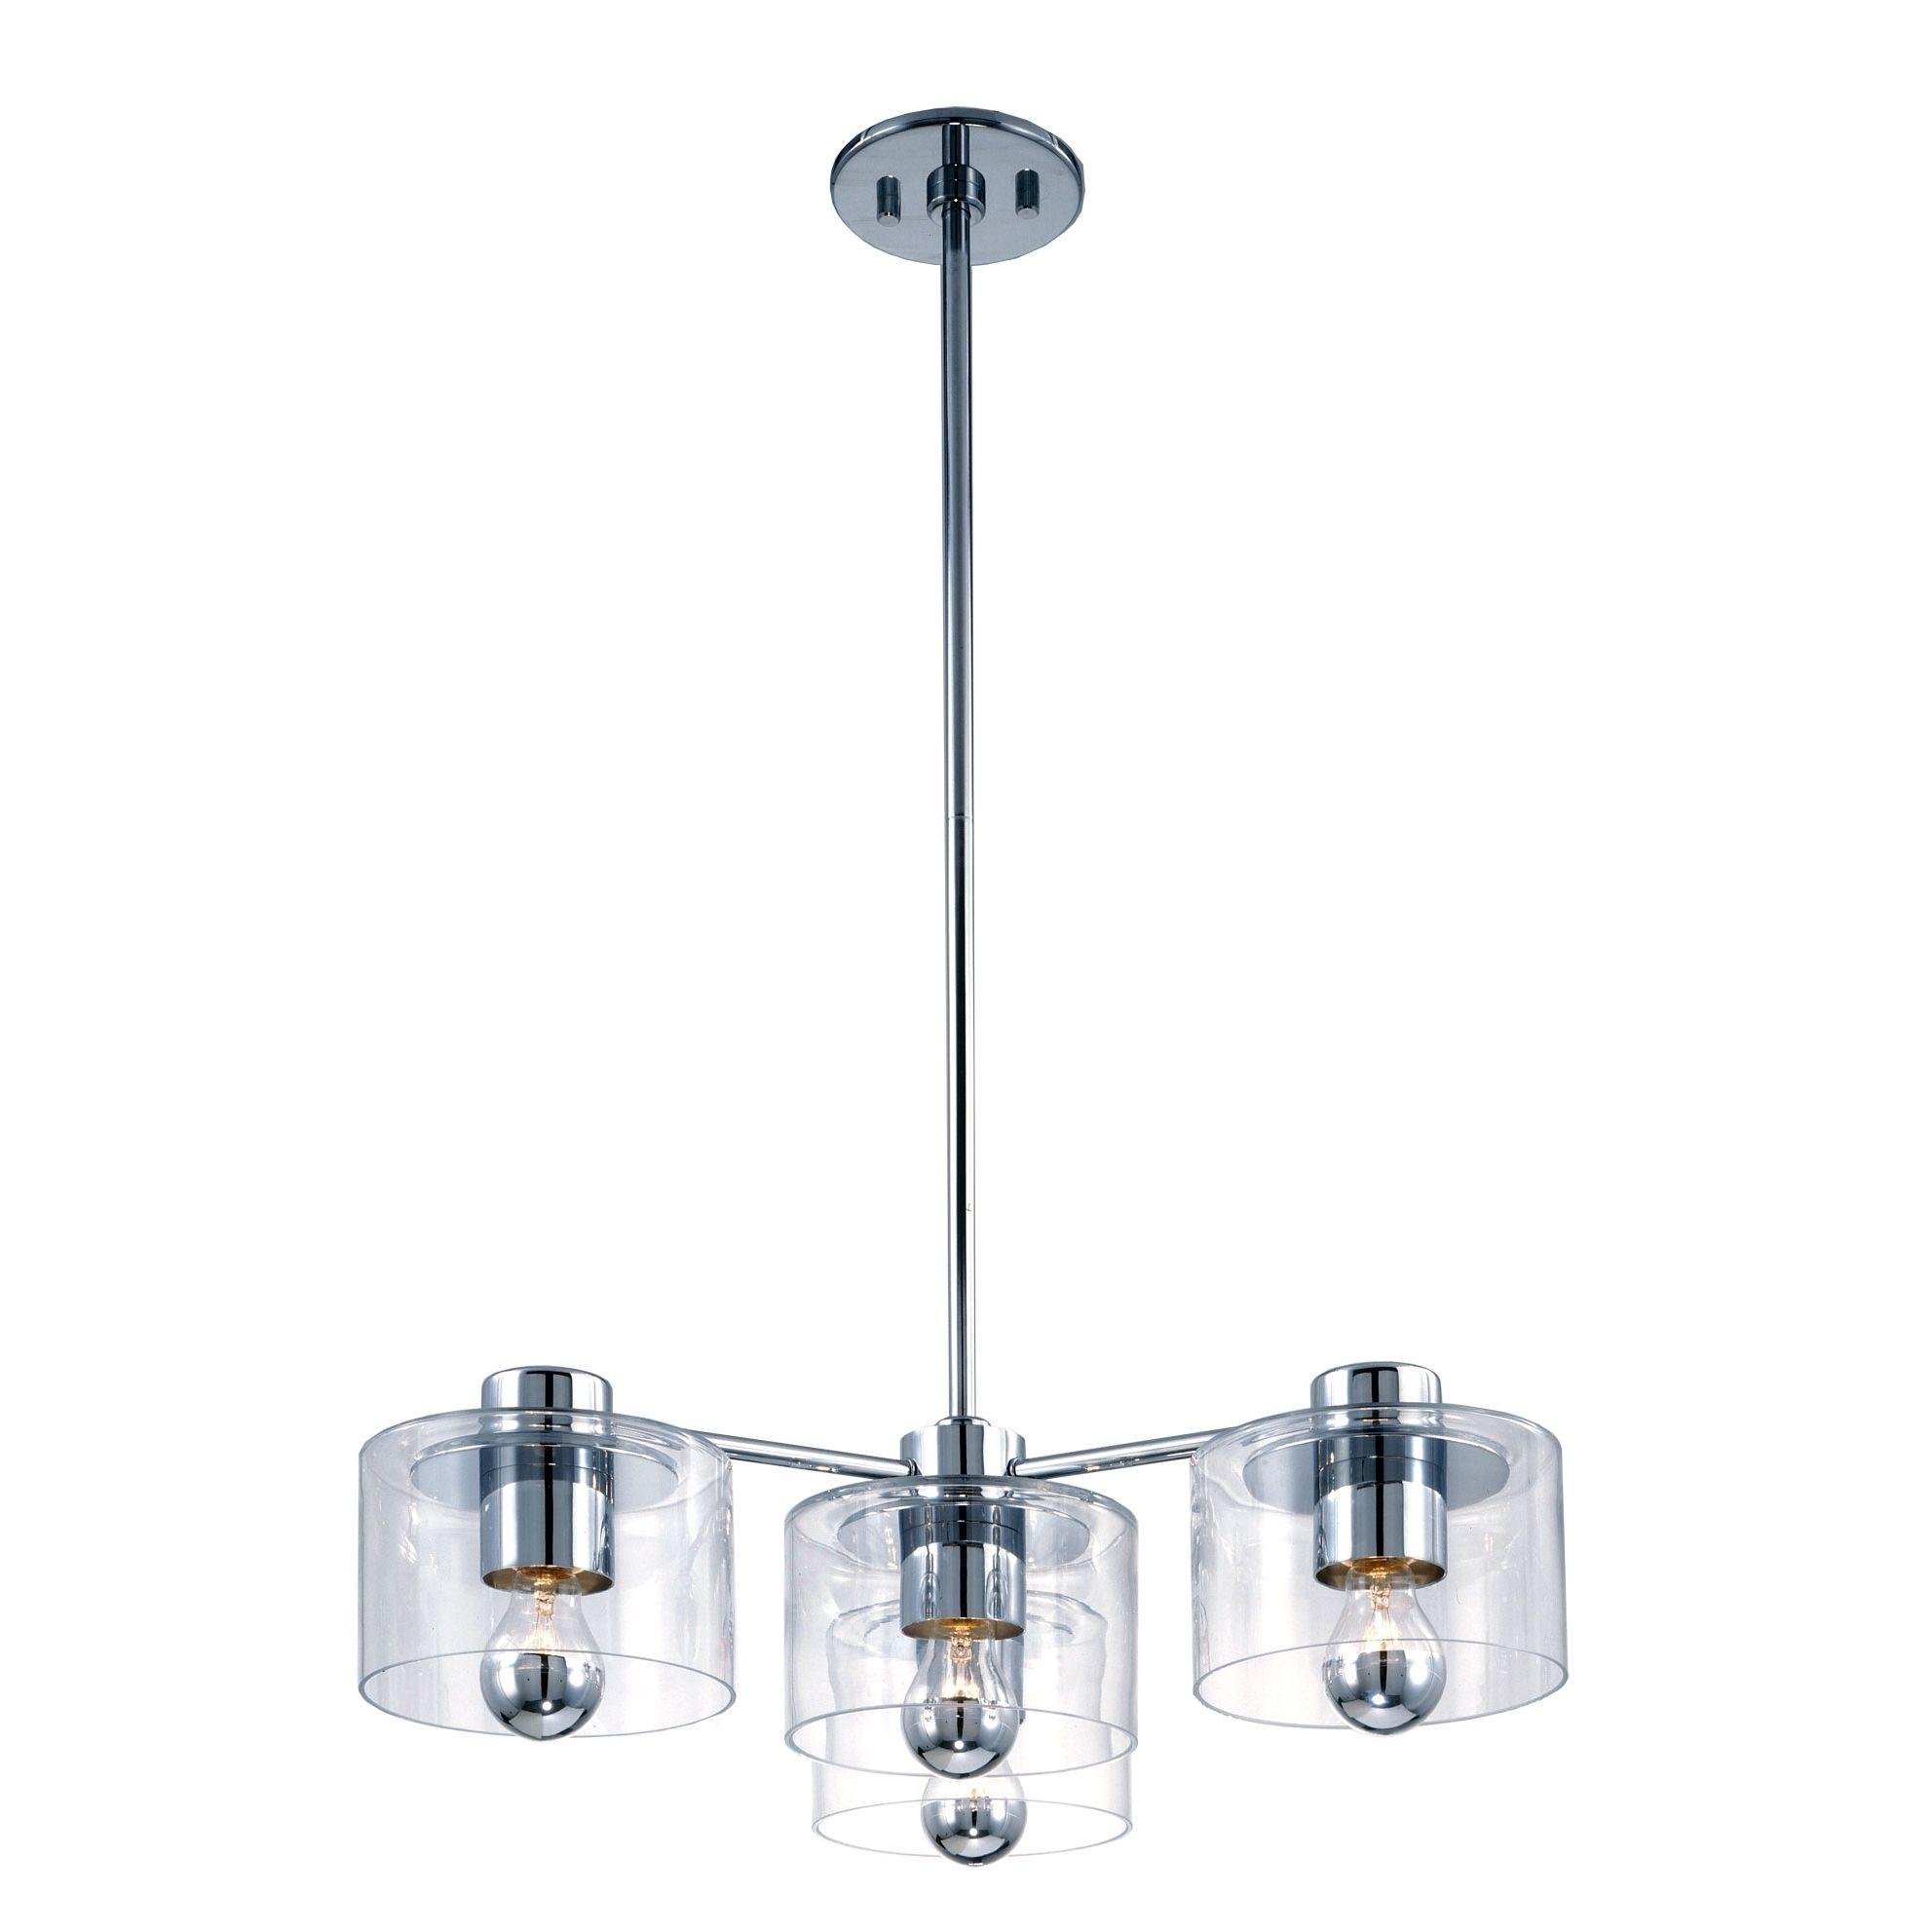 Sonneman Lighting Transparence 4-light Polished Chrome Pendant | Overstock.com Shopping - The Best Deals on Chandeliers & Pendants